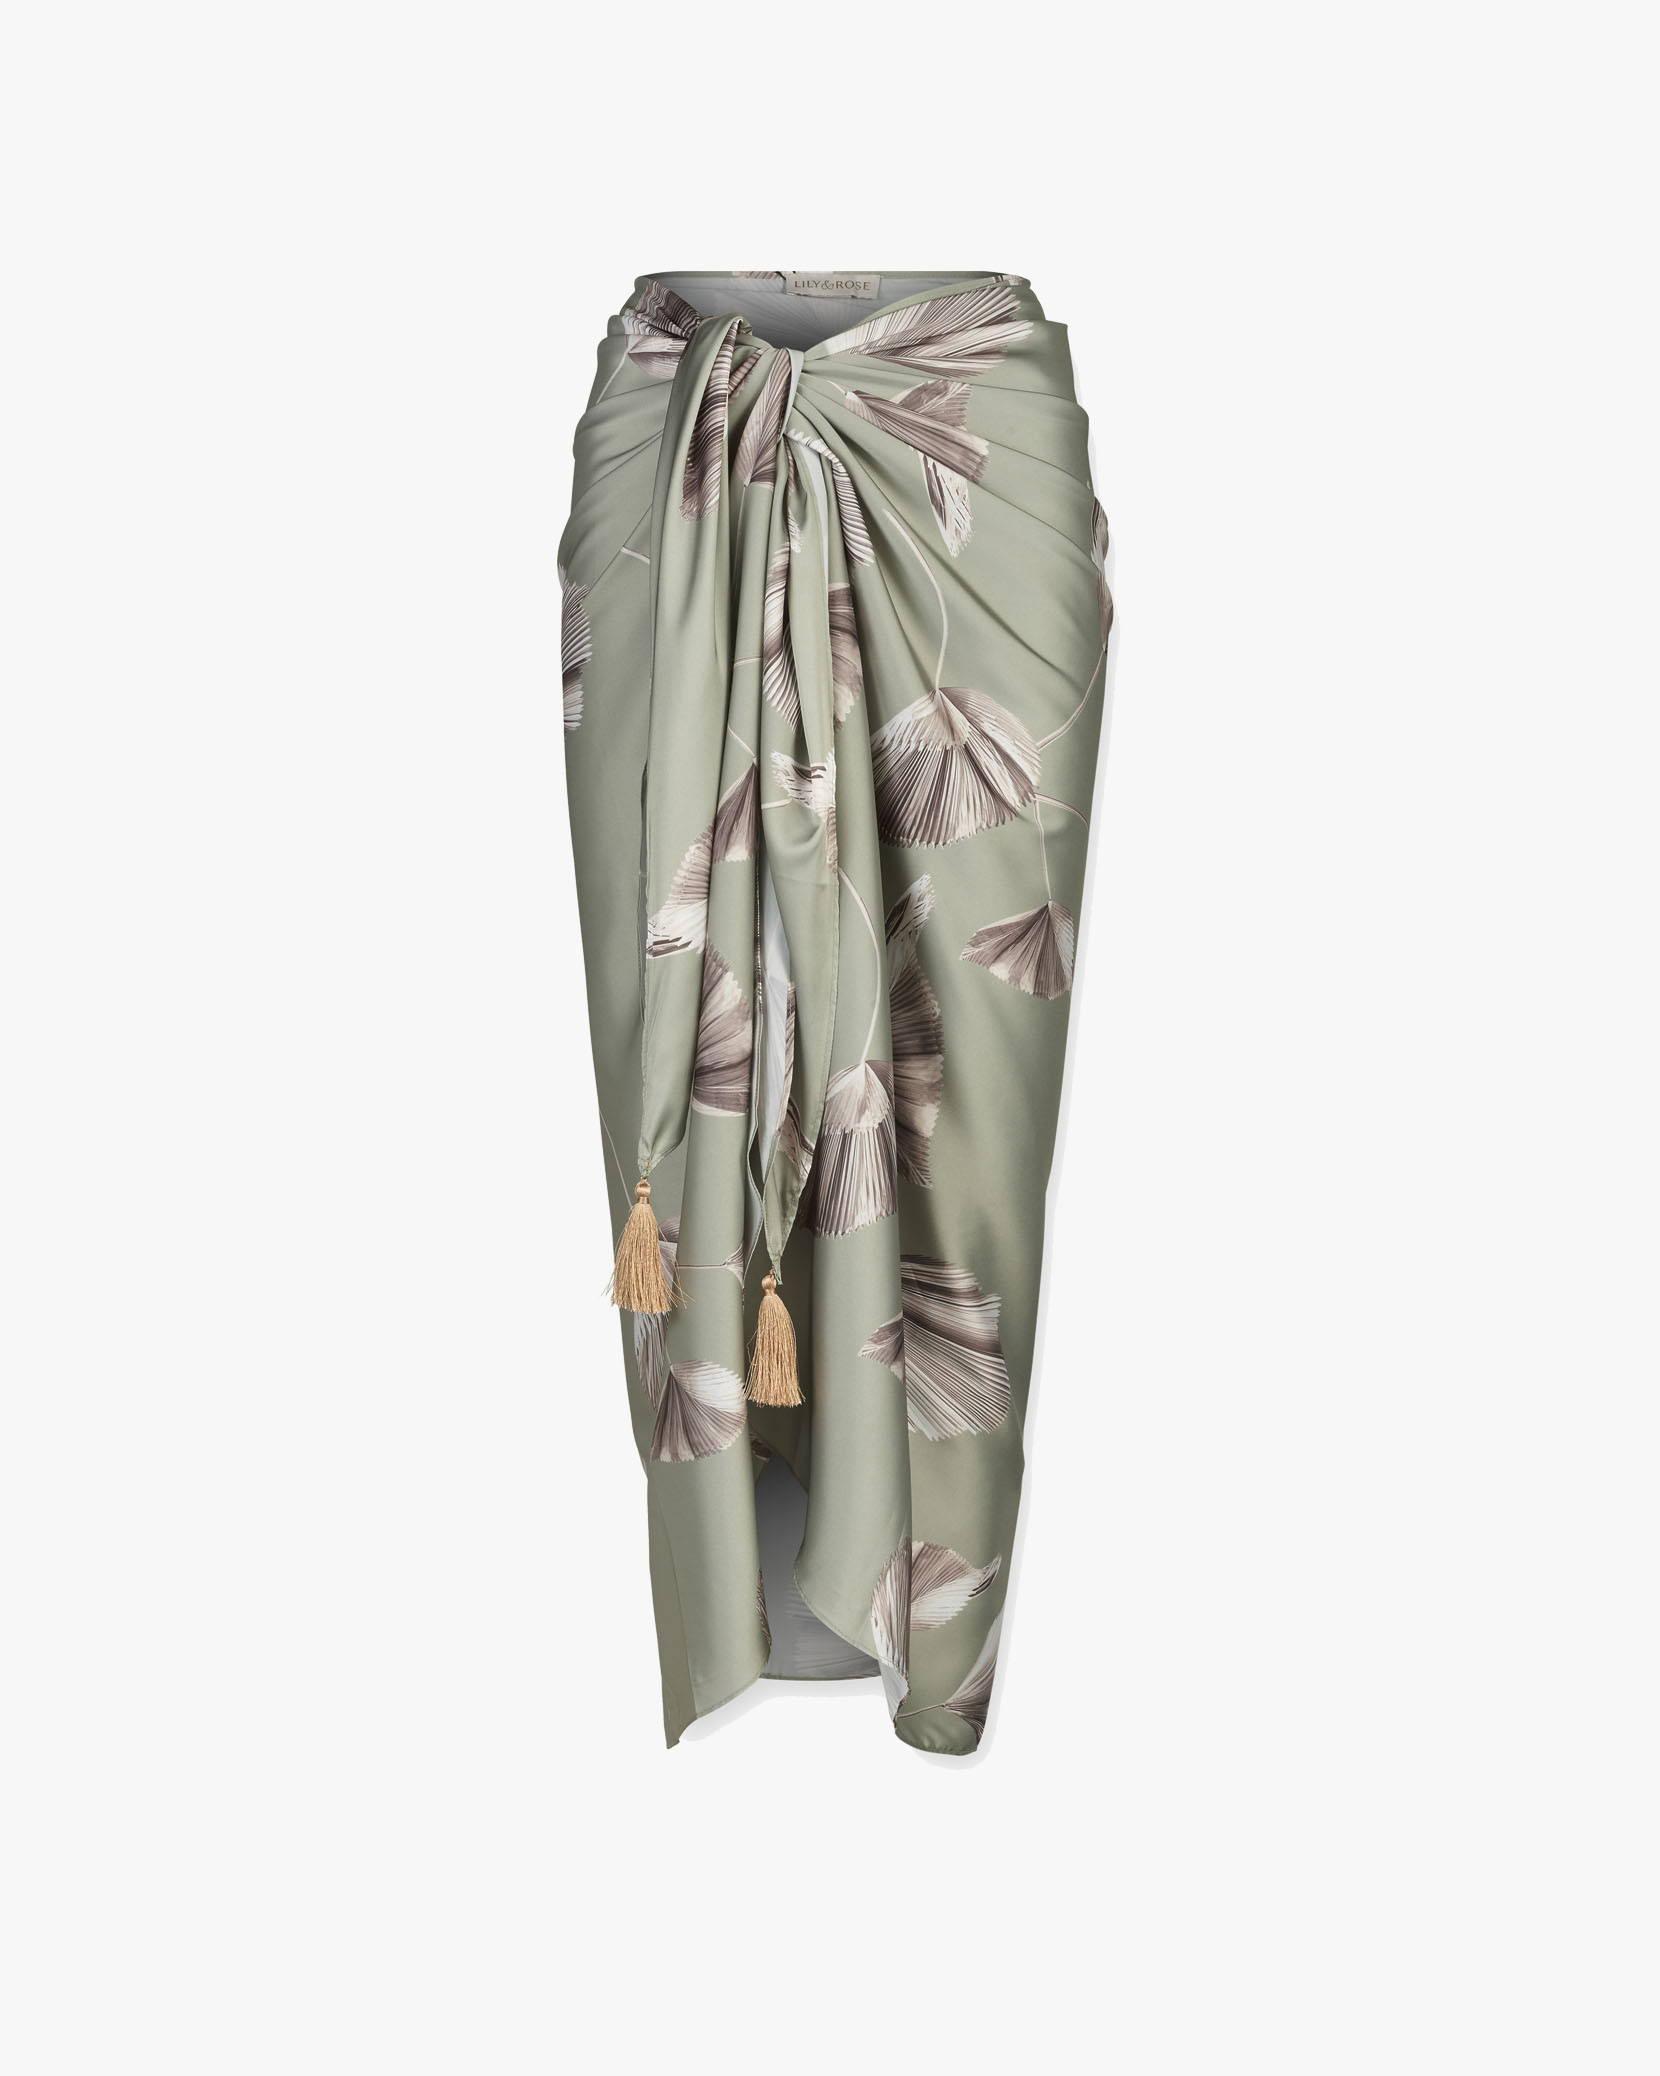 Lily & Rose Swimwear Envy sarong